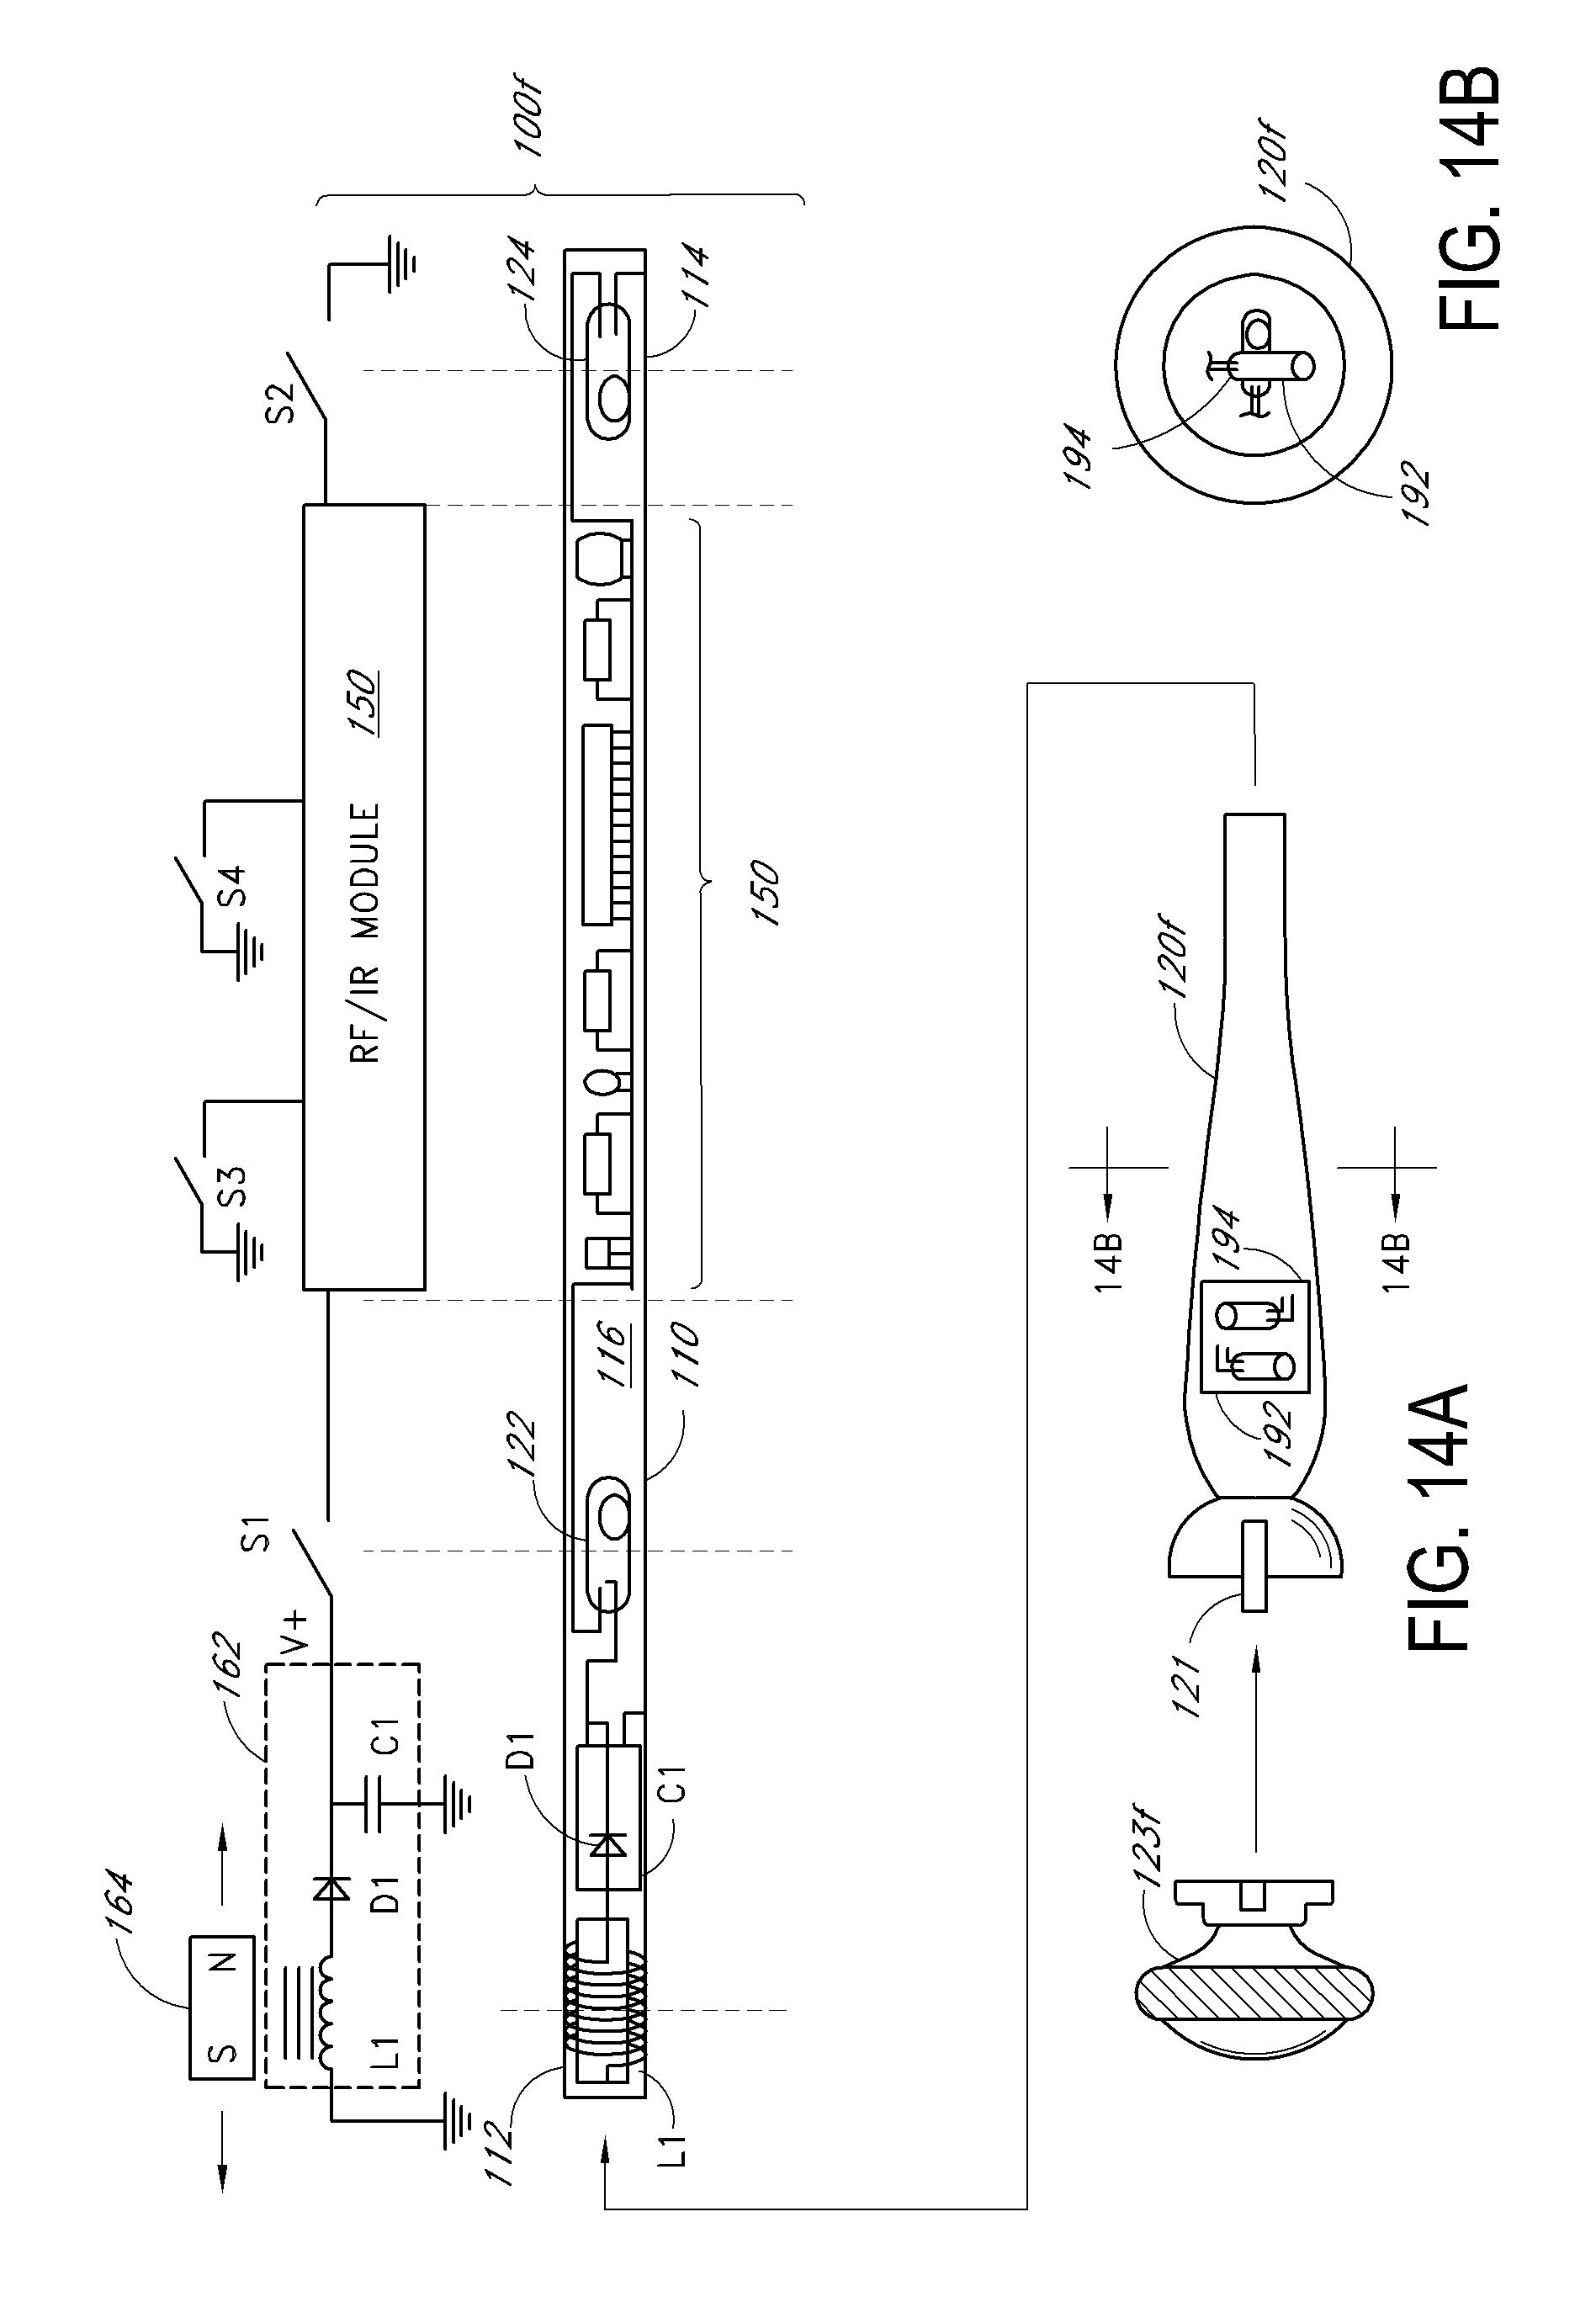 Patent Us 9039533 B2 Quartz Oscillator Circuits Http Circuitdiagramhqewnet